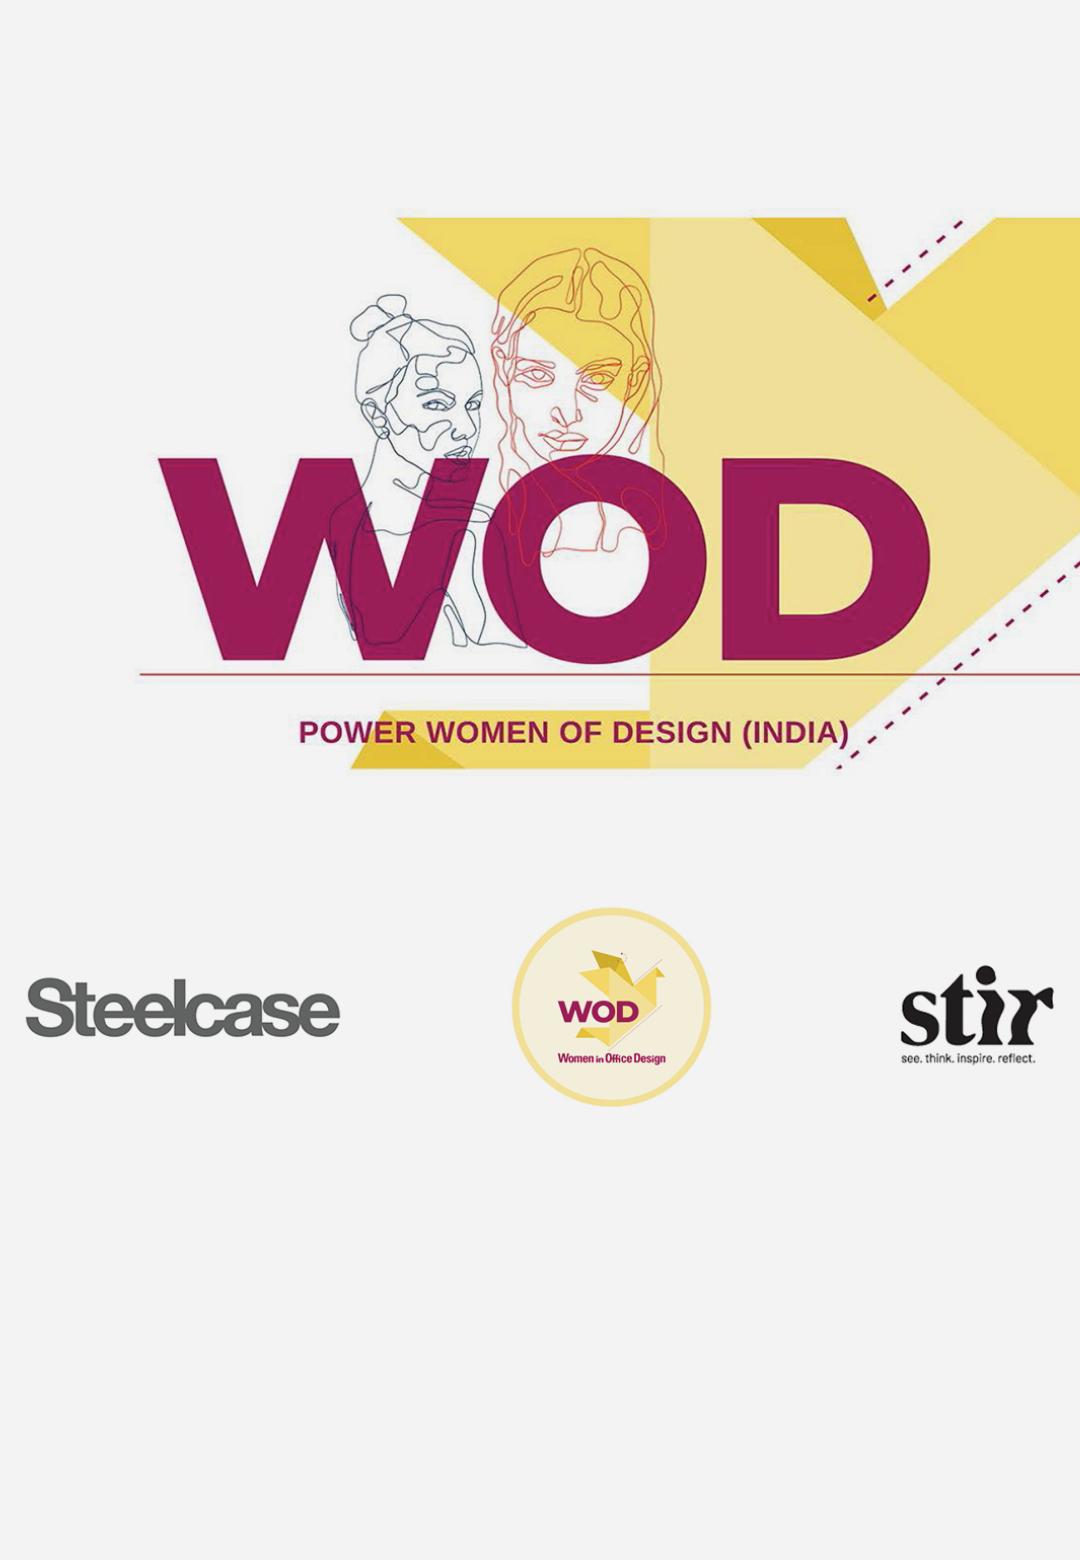 Power Women of Design, an initiative by WOD UK | Power Women of Design | Harsha Kotak and Payal Sandhu Khurana | STIRworld